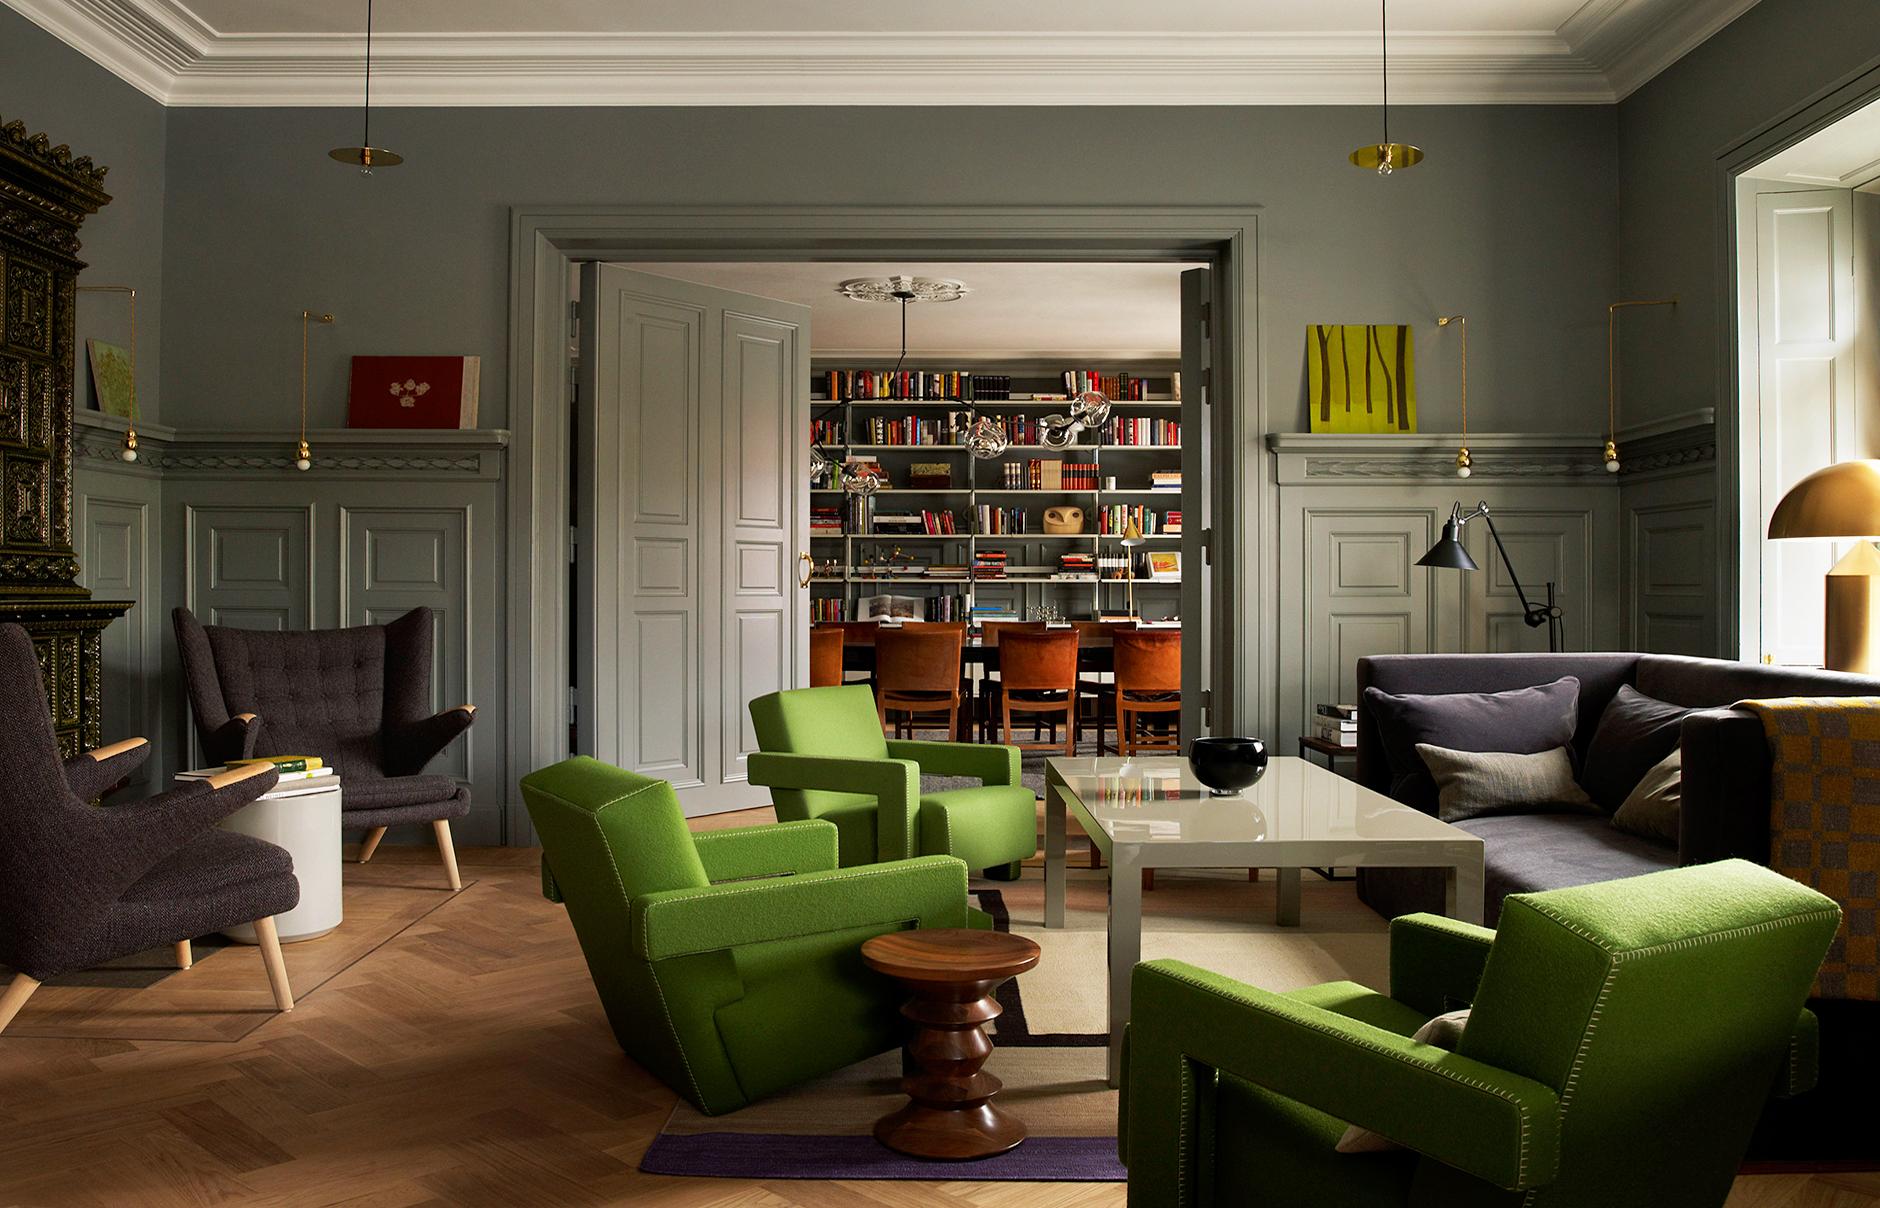 Hem Design a home from home at ett hem stockholm luxury hotels travelplusstyle